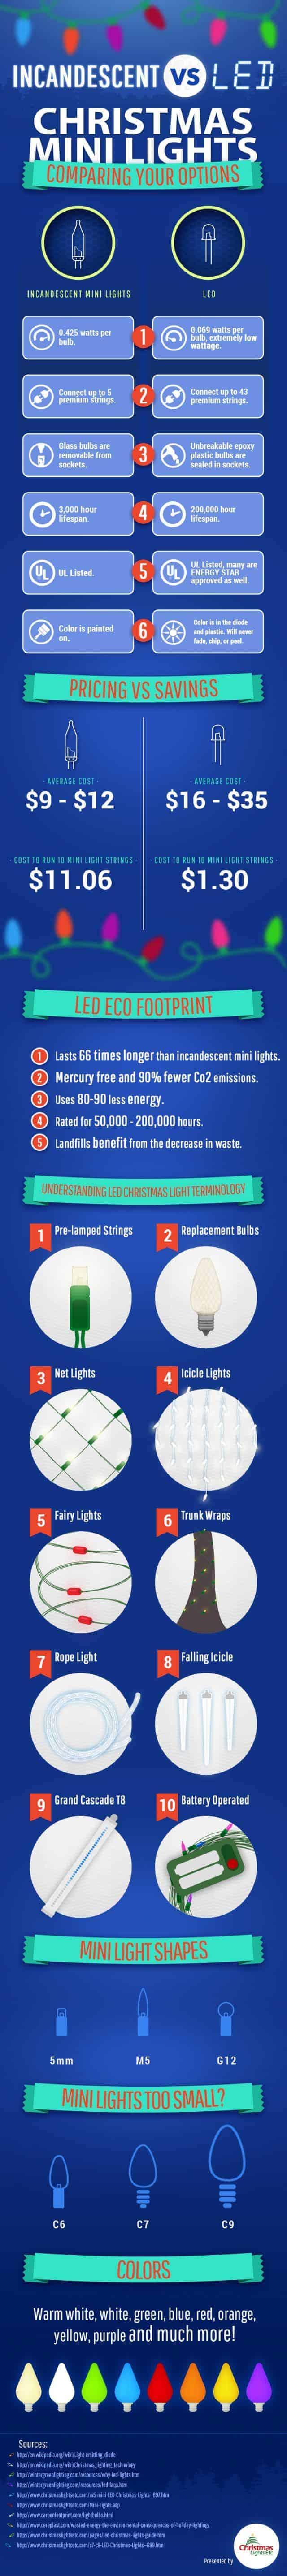 Incandescent Vs LED Christmas Lights Infographic